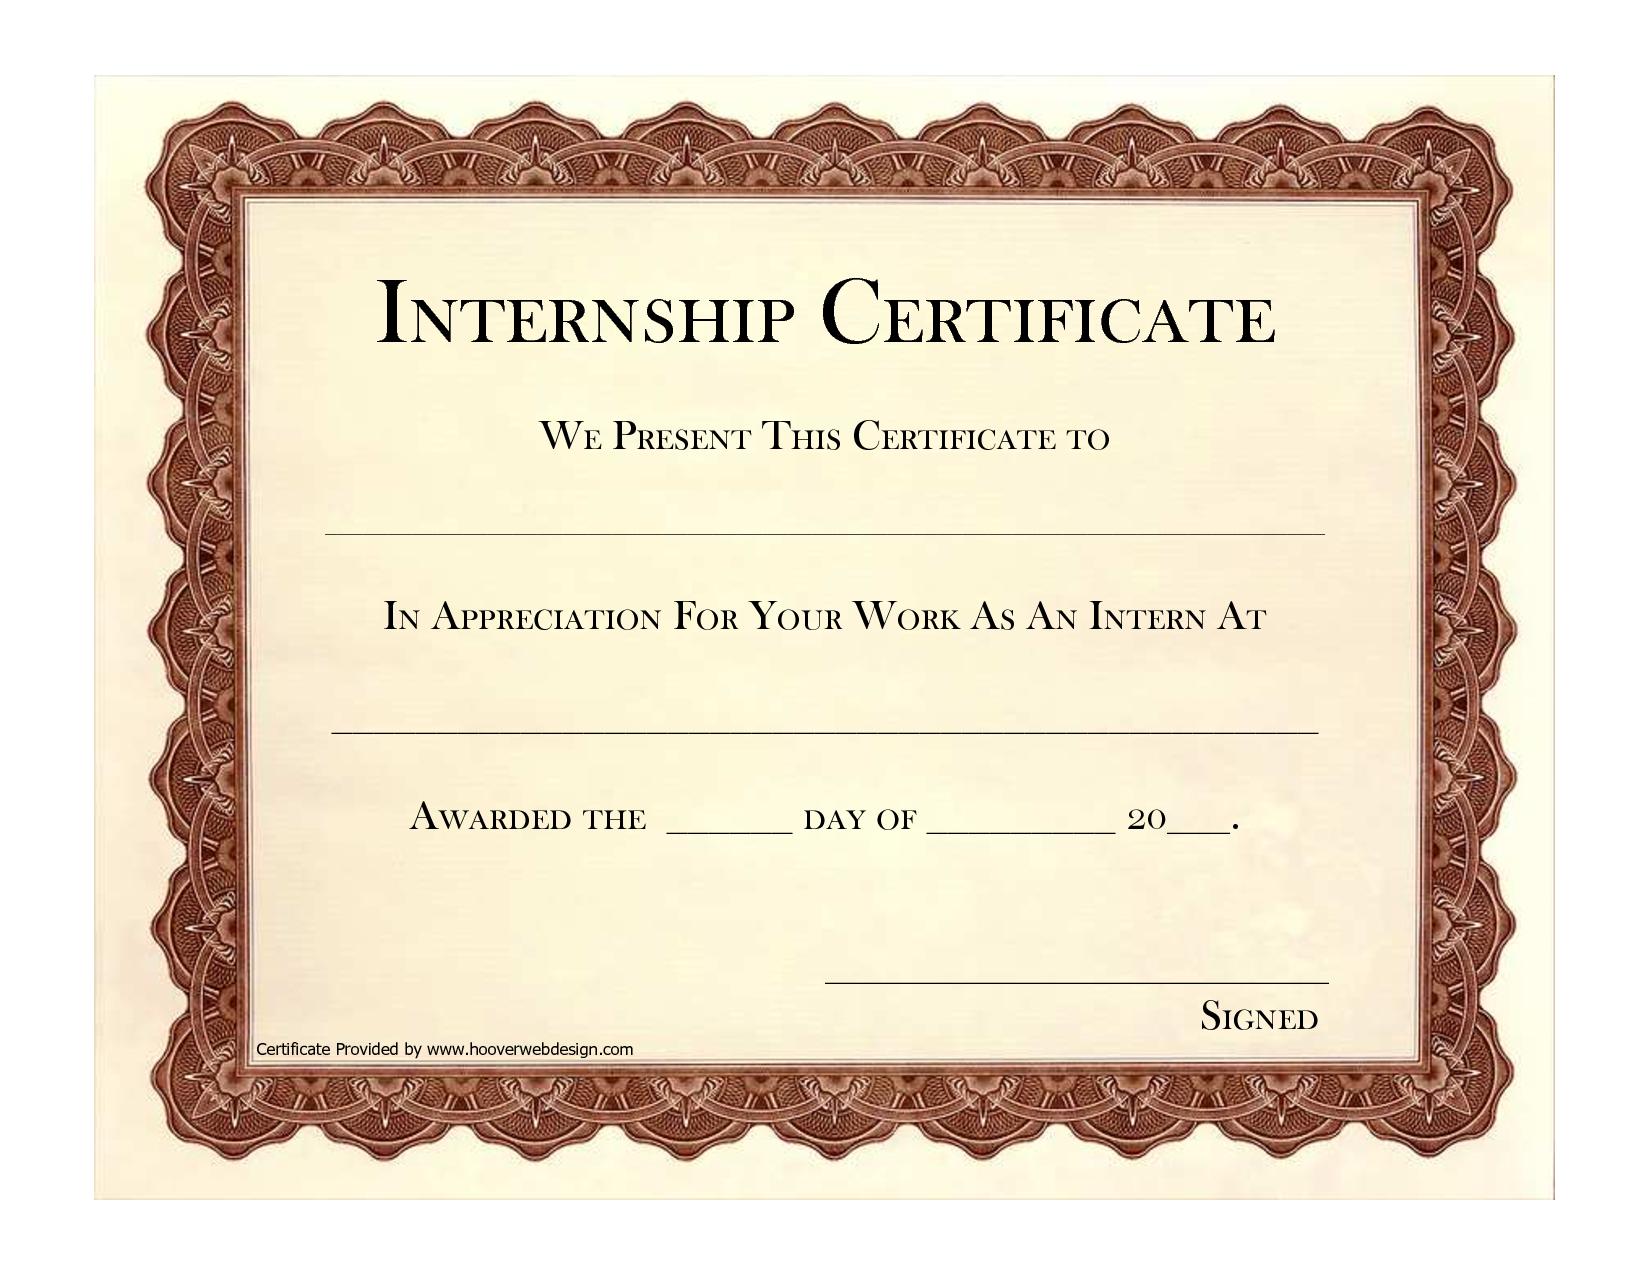 9 internship certificate formats free printable word pdf 9 internship certificate formats free printable word pdf yelopaper Choice Image